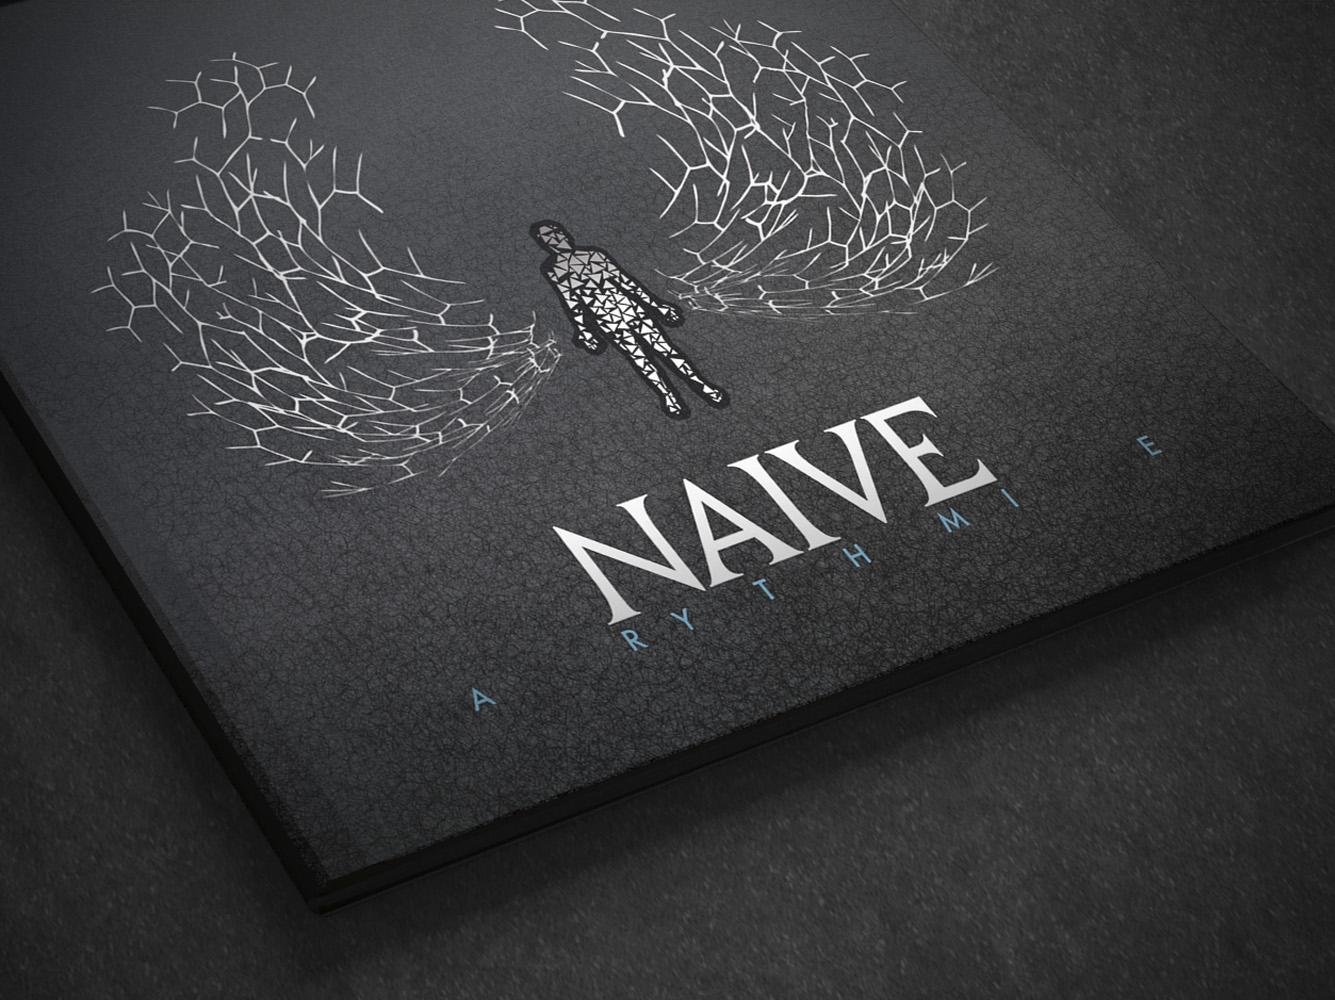 Naïve | Arythmie